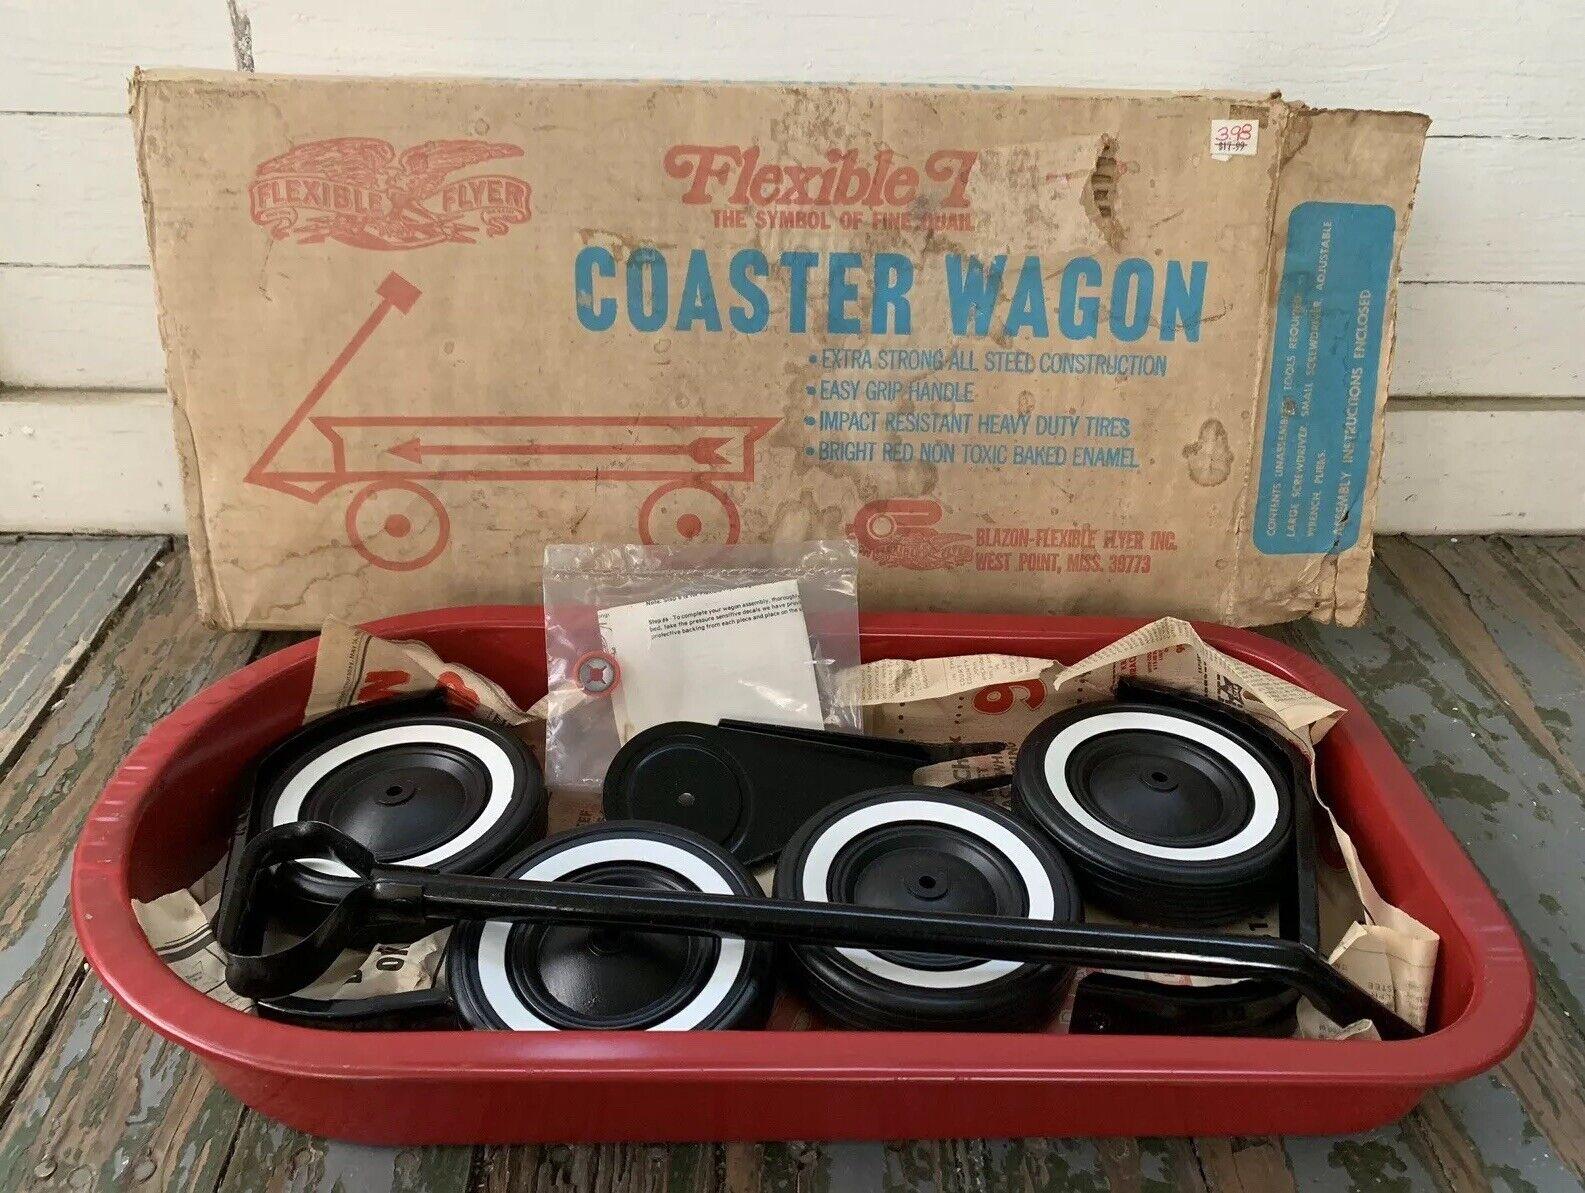 Vintage Flexible Flyer Coaster Wagon Metal Pull Wagon New In Box